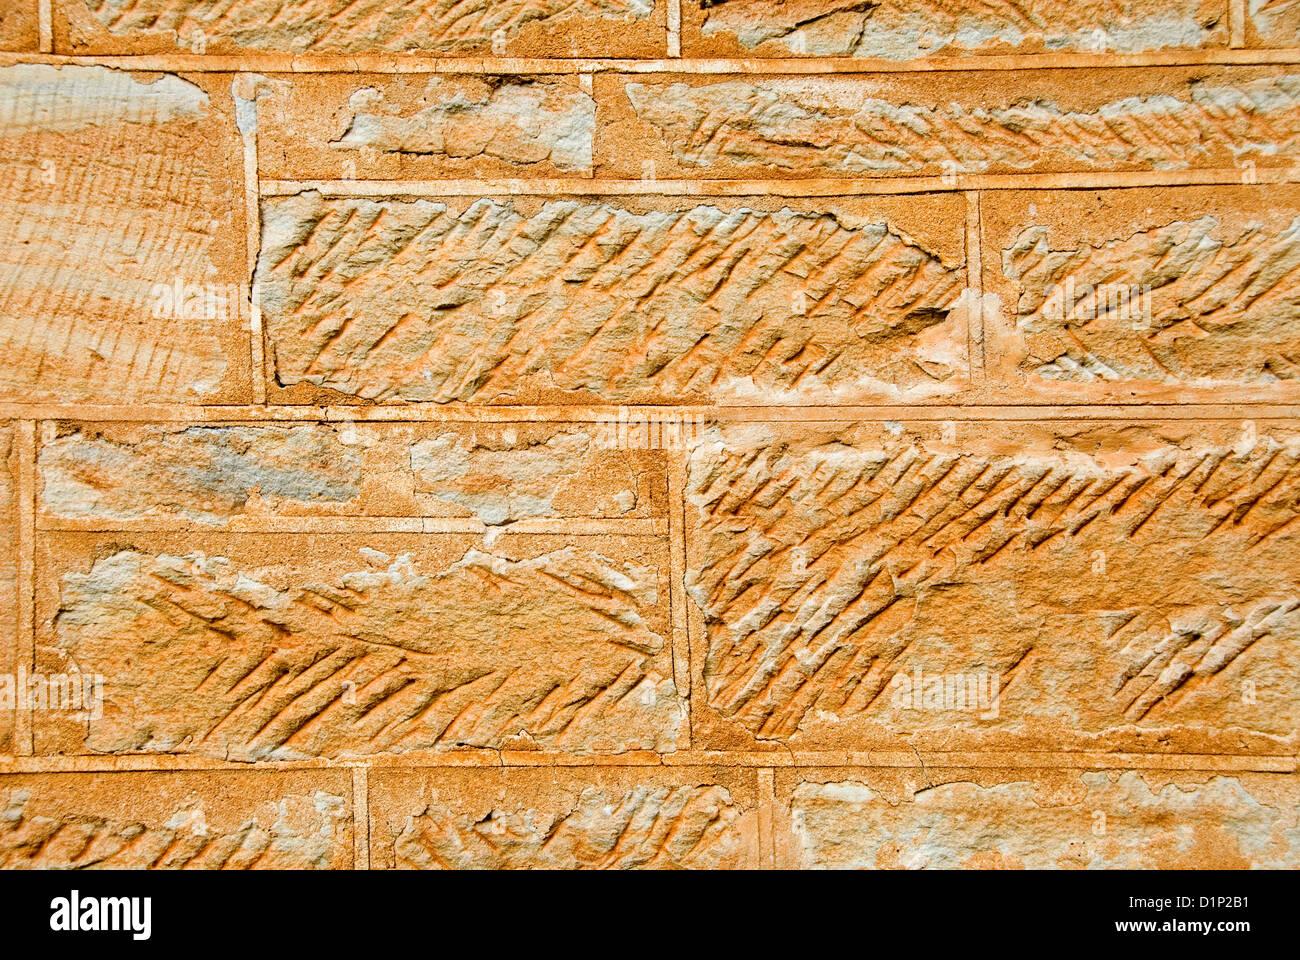 Sandstone Block Wall Stock Photos & Sandstone Block Wall Stock ...